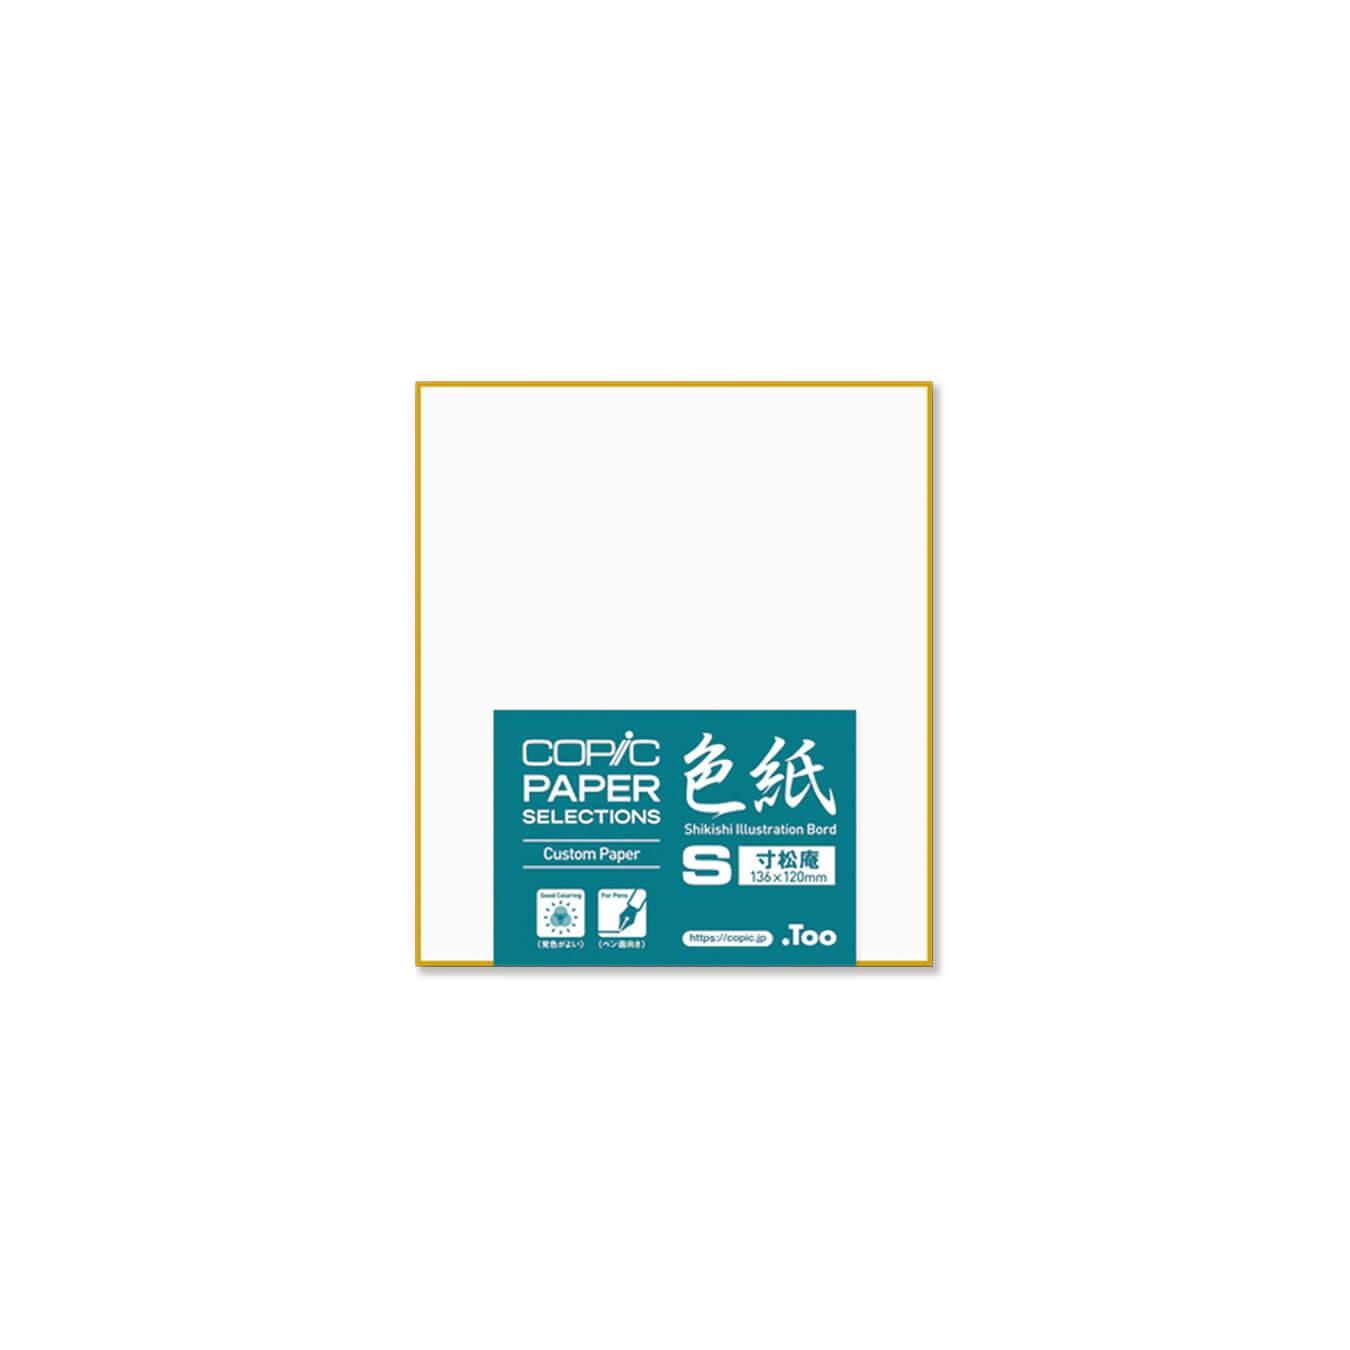 Copic Shikishi Illustration Board S size